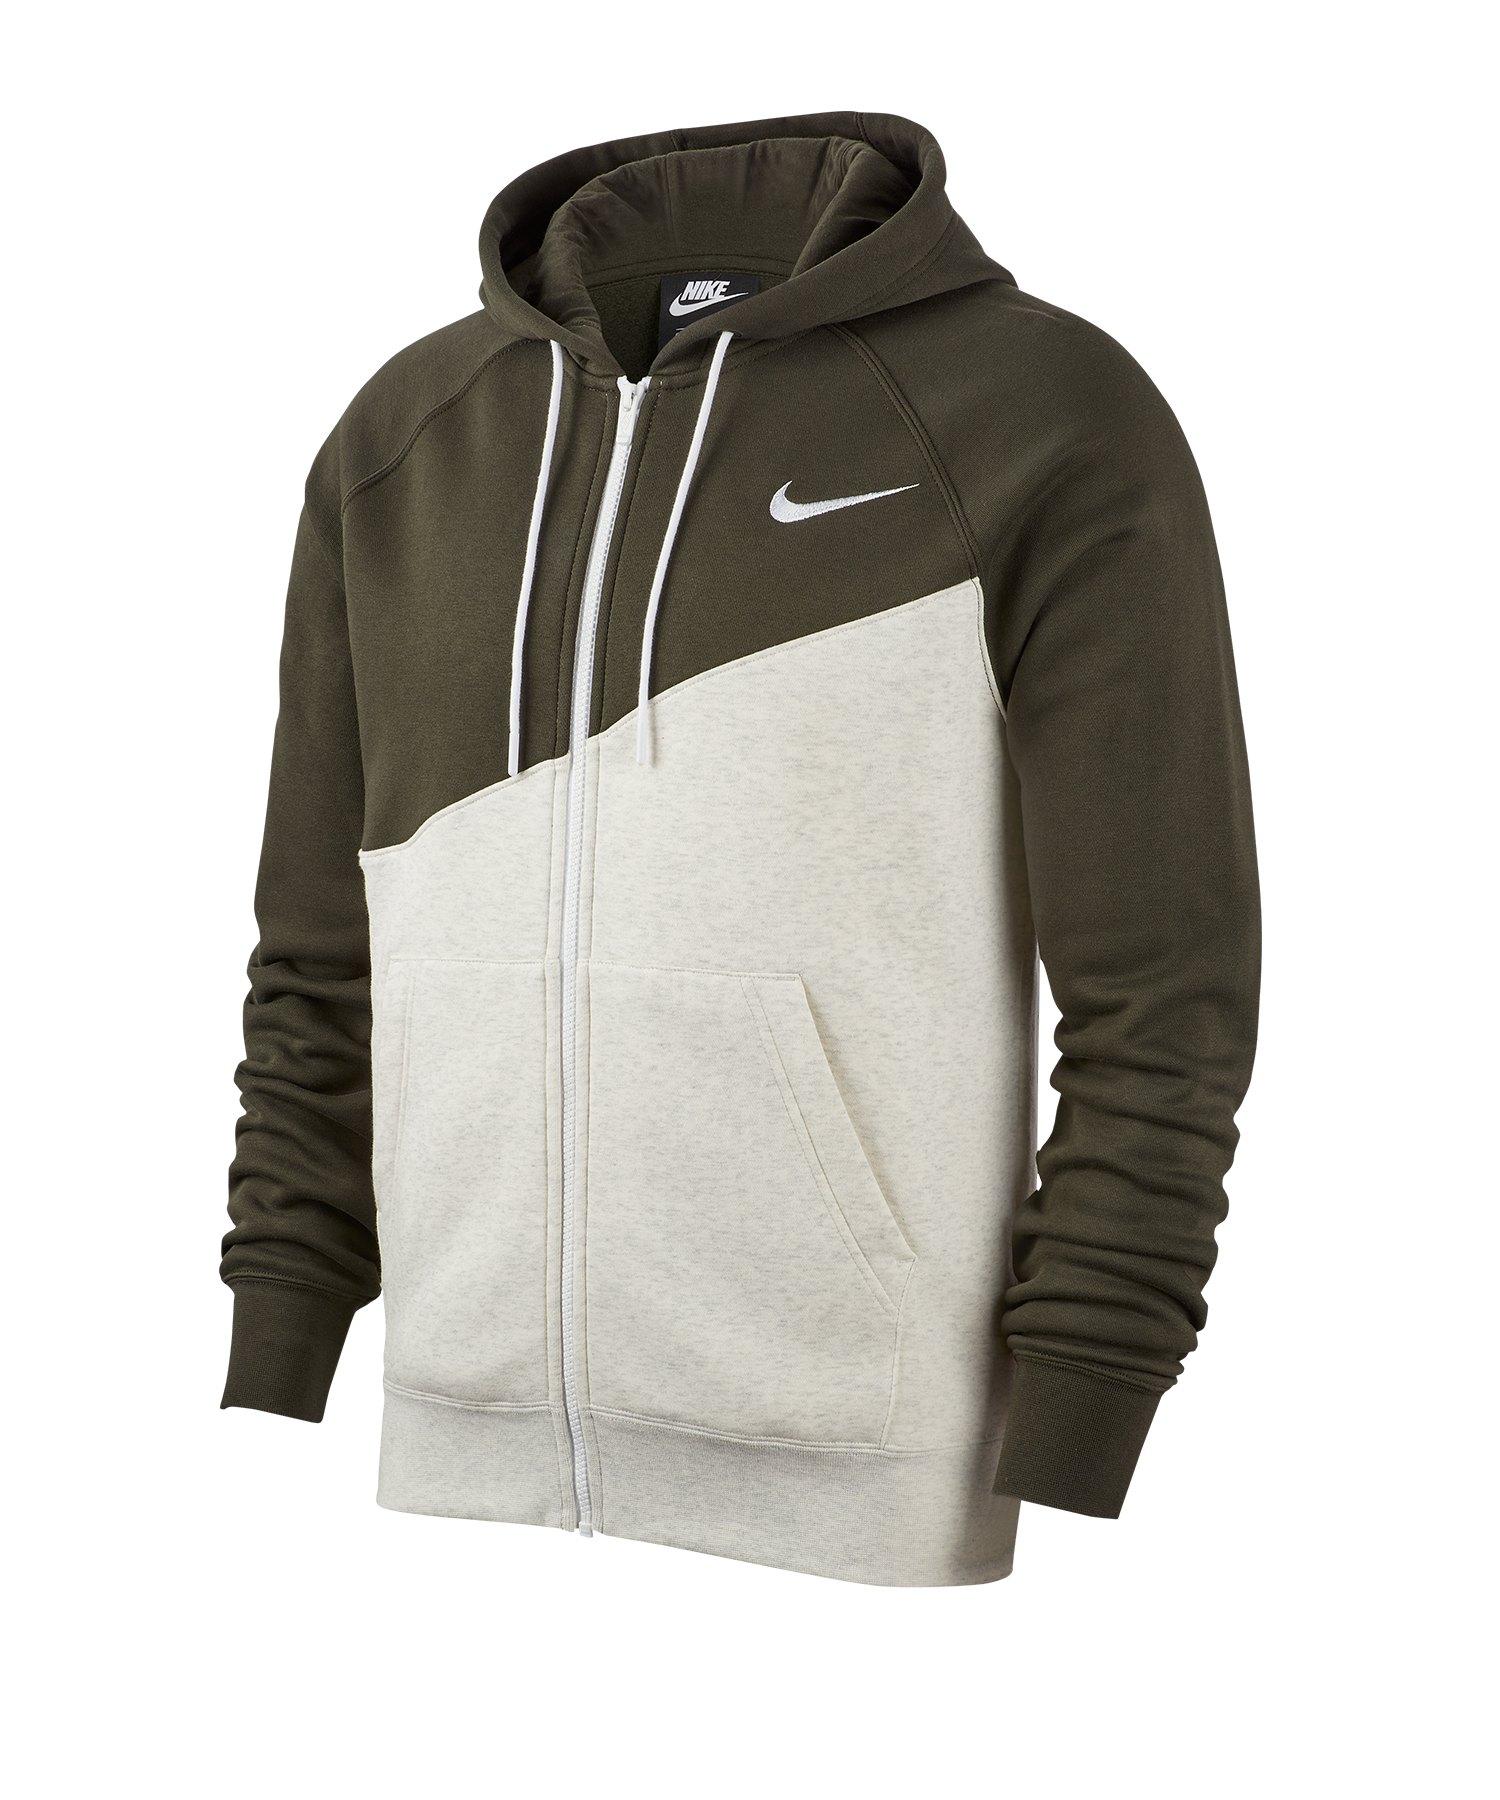 Nike Swoosh Full-Zip Kapuzenjacke Weiss F141 - weiss